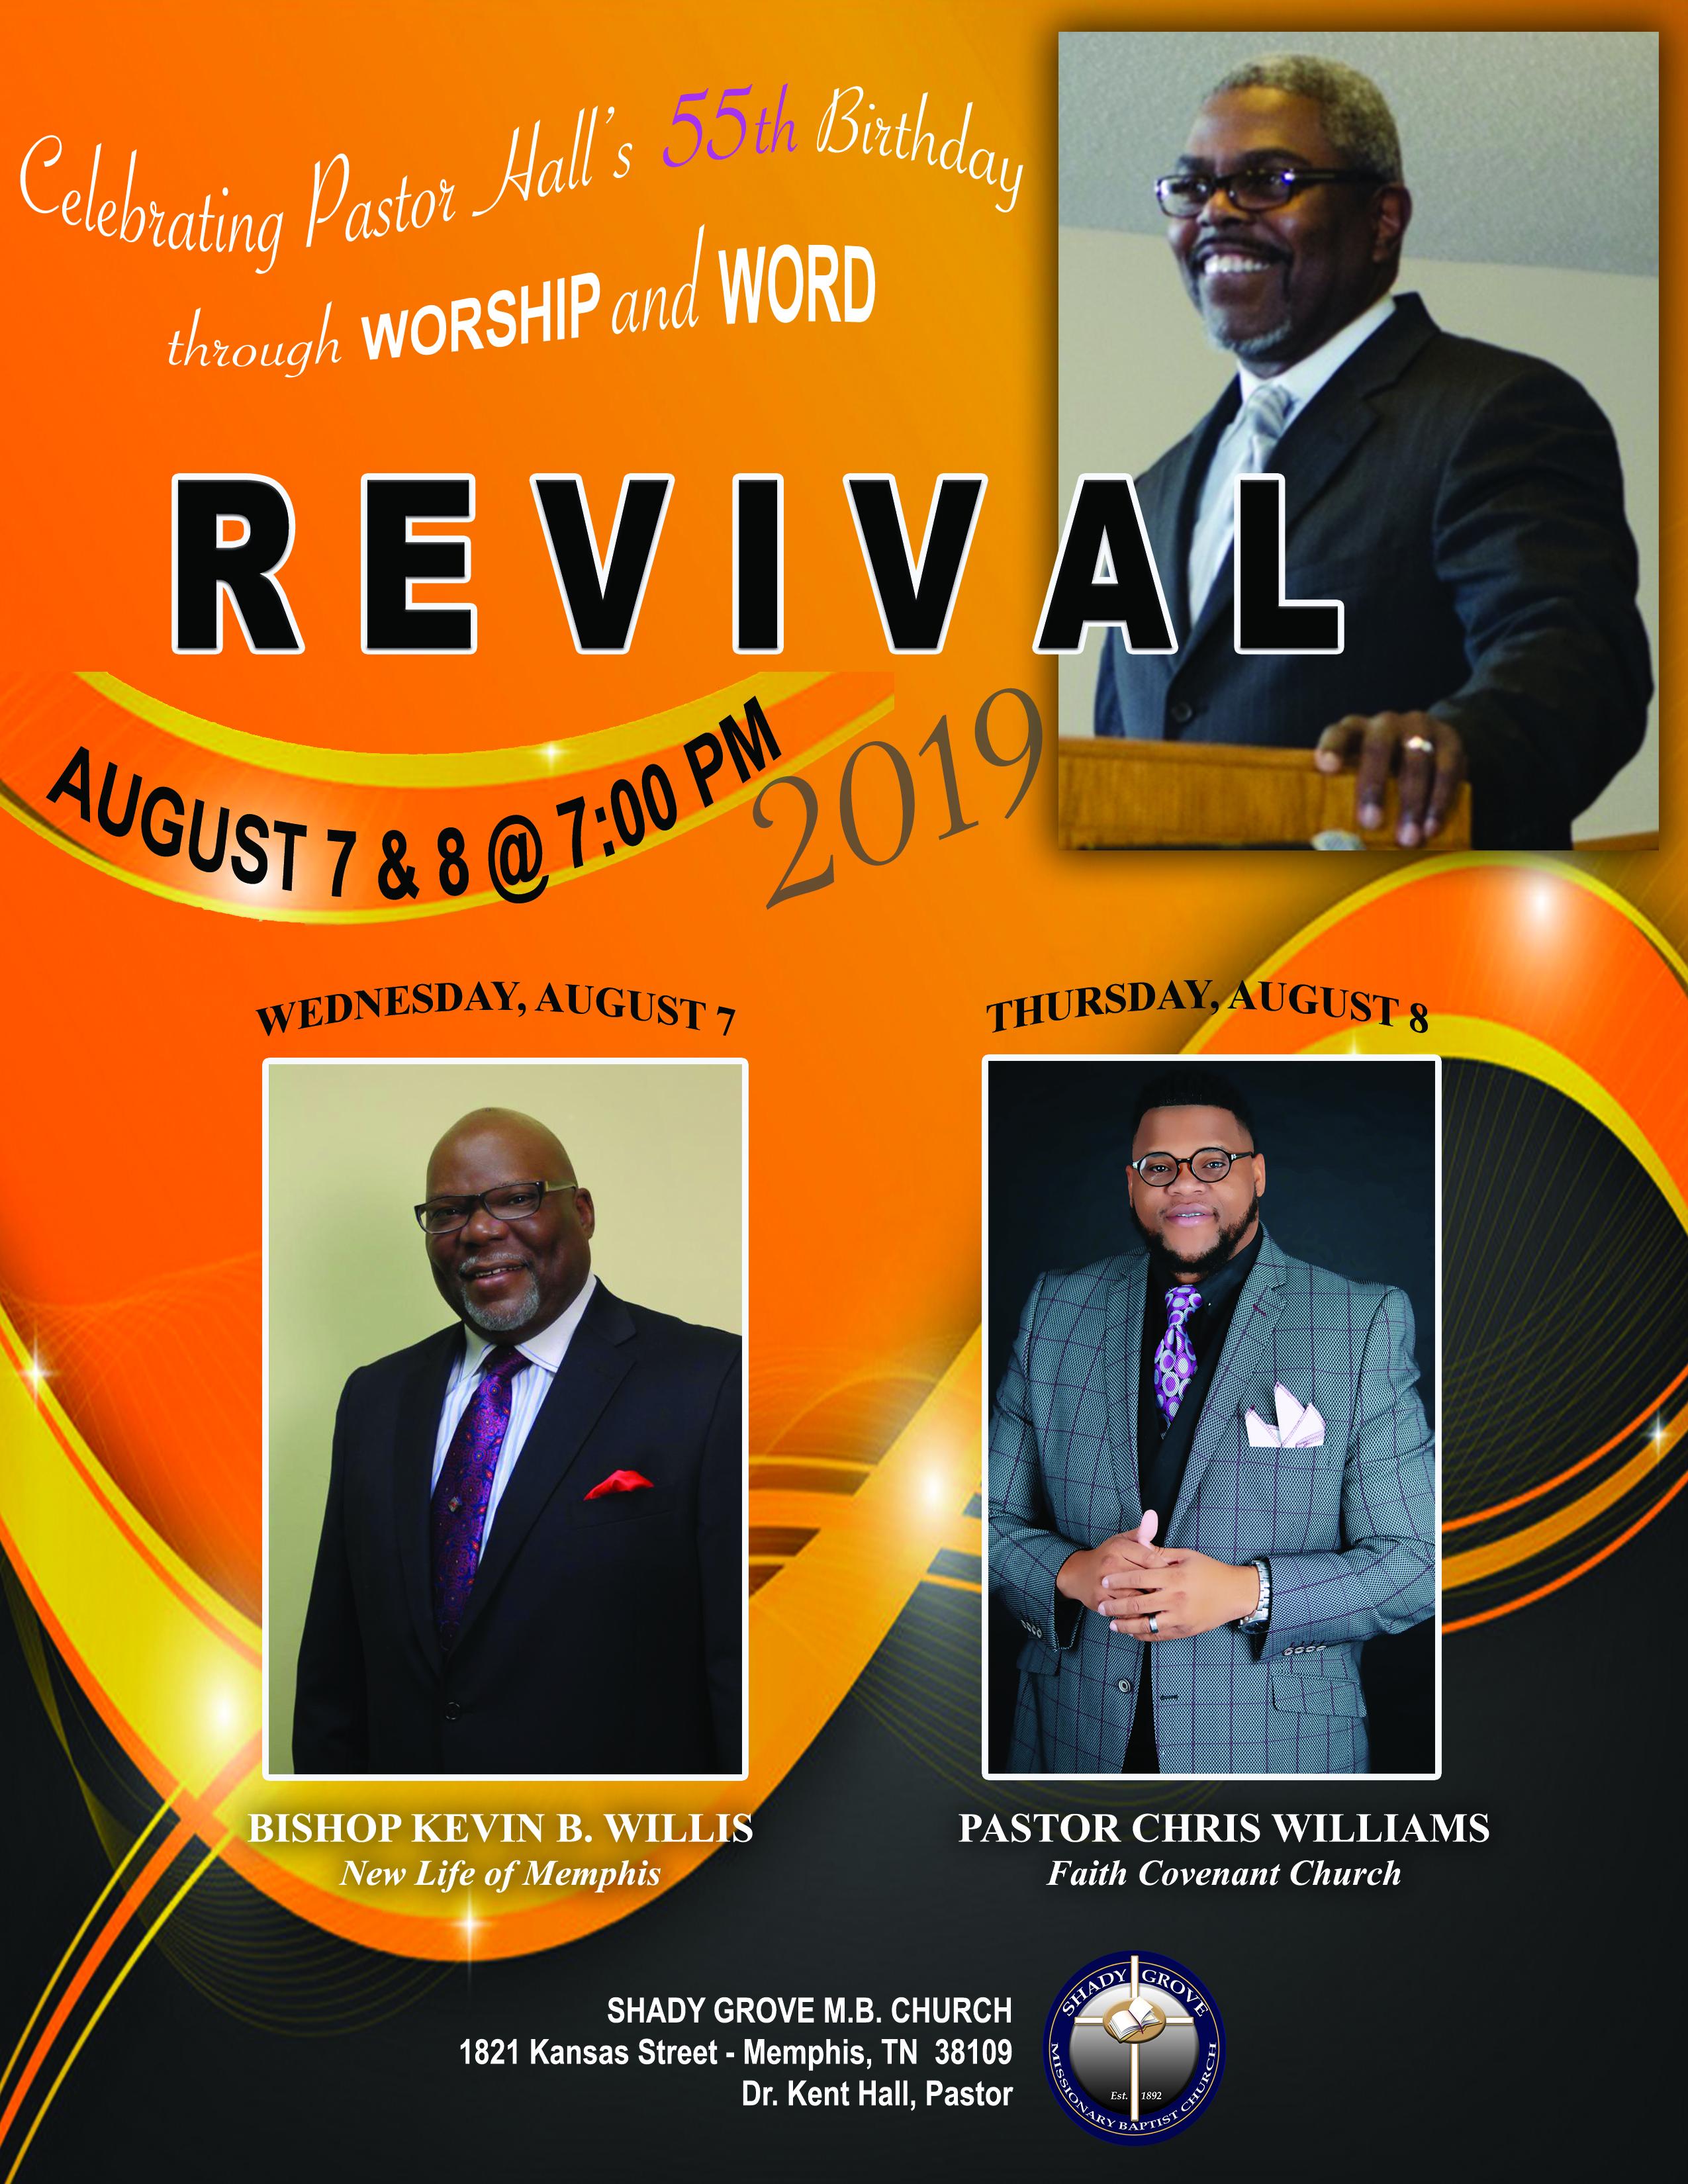 Shady Grove Missionary Baptist Church | Revival 2019